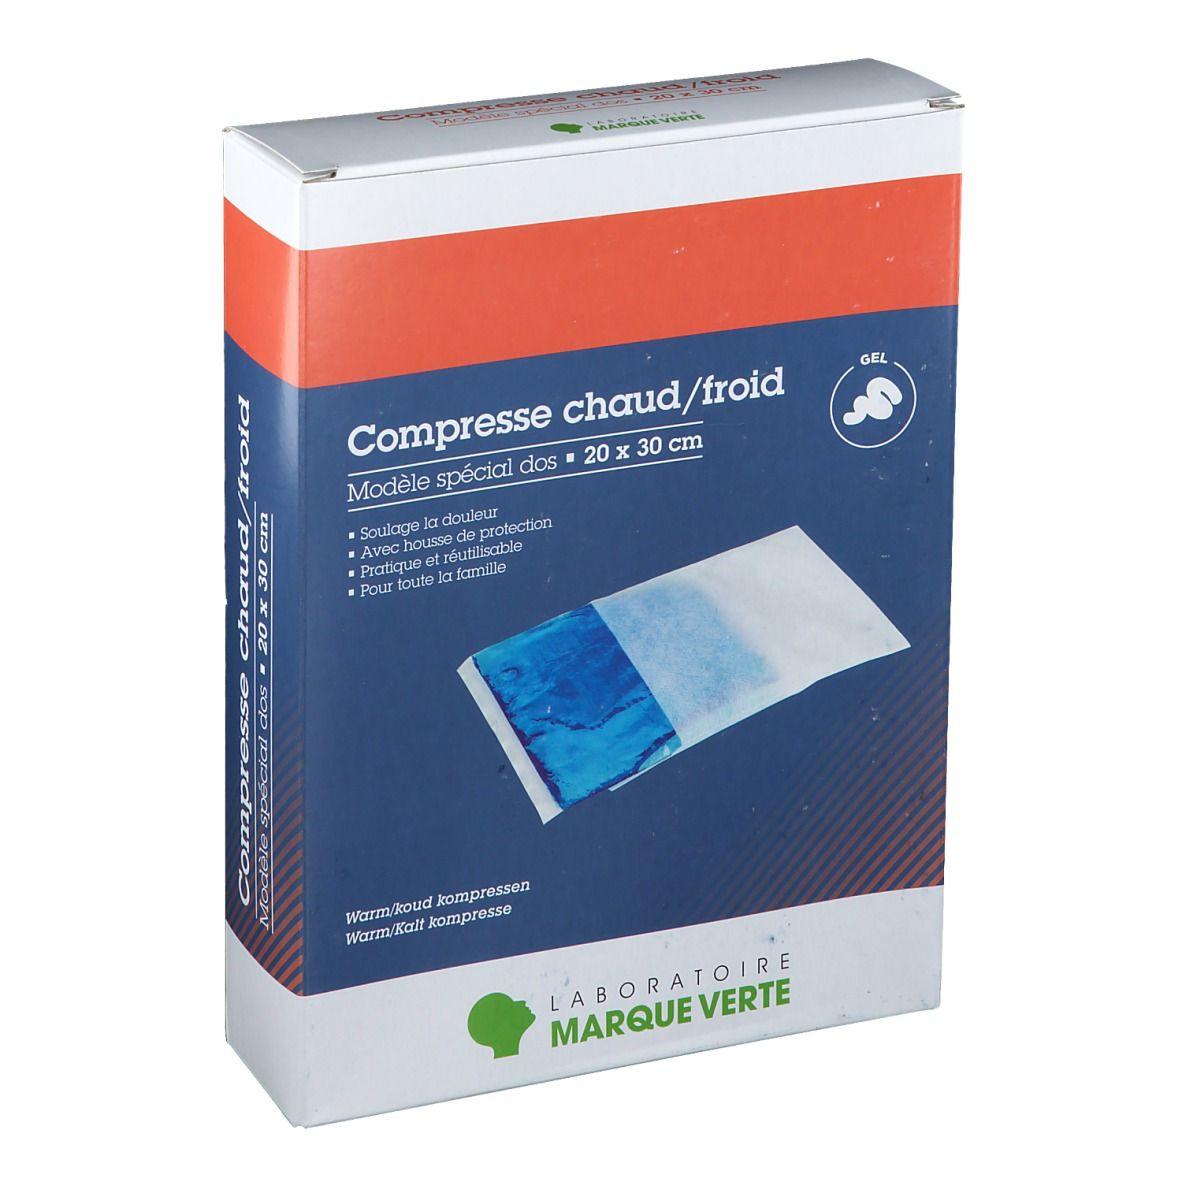 Marque Verte Compresse chaud / froid Dos 20 x 30 cm pc(s) compresse(s)